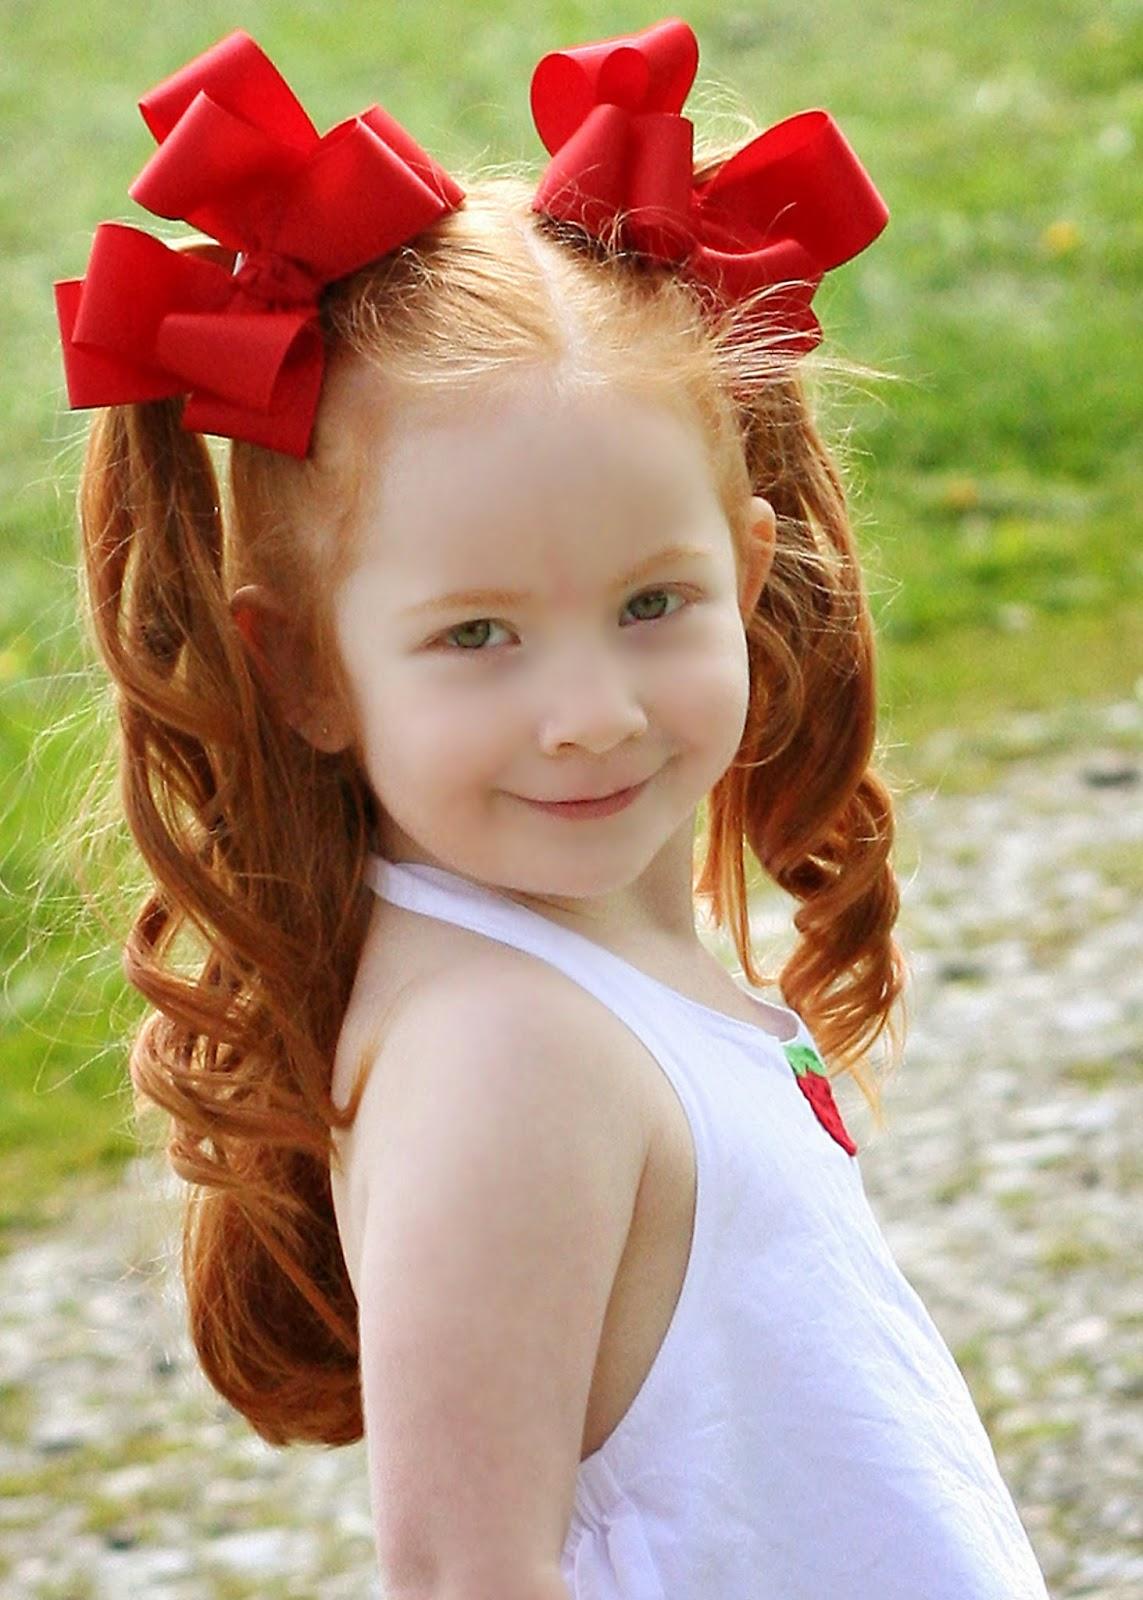 Castaway auburn hair and little girl